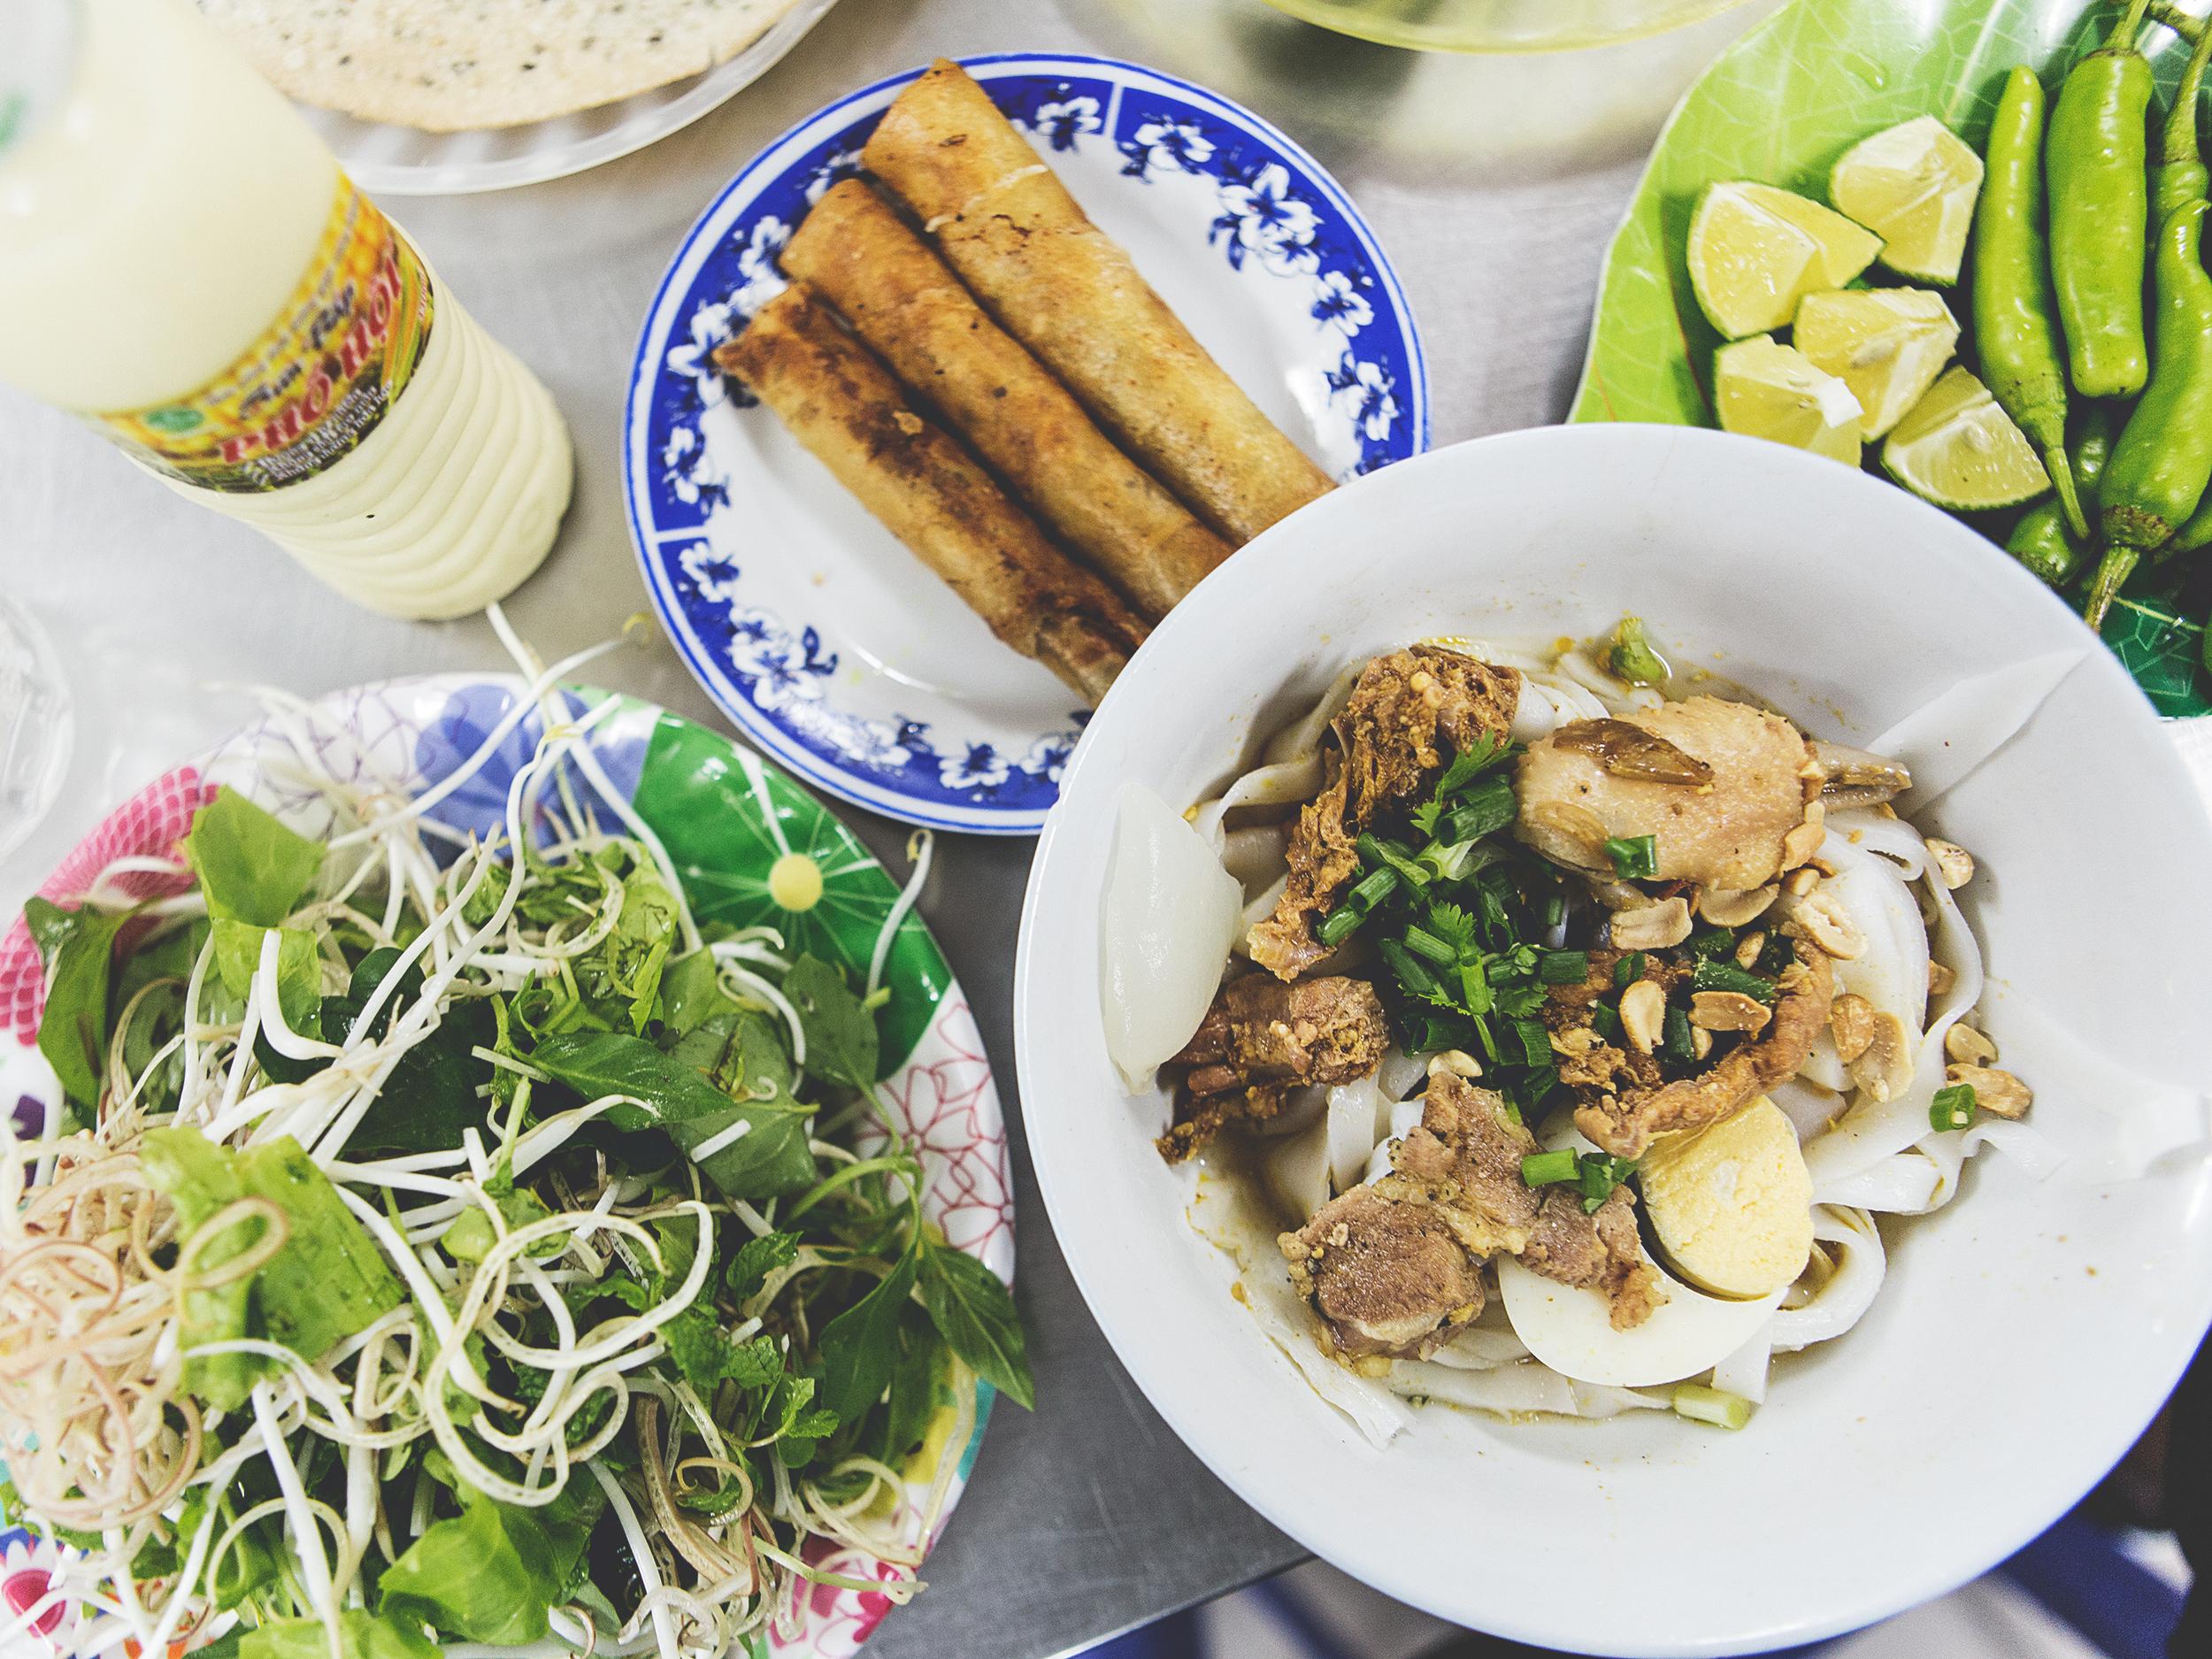 20140826-danang-vietnam-bavi2-brian-oh.jpg